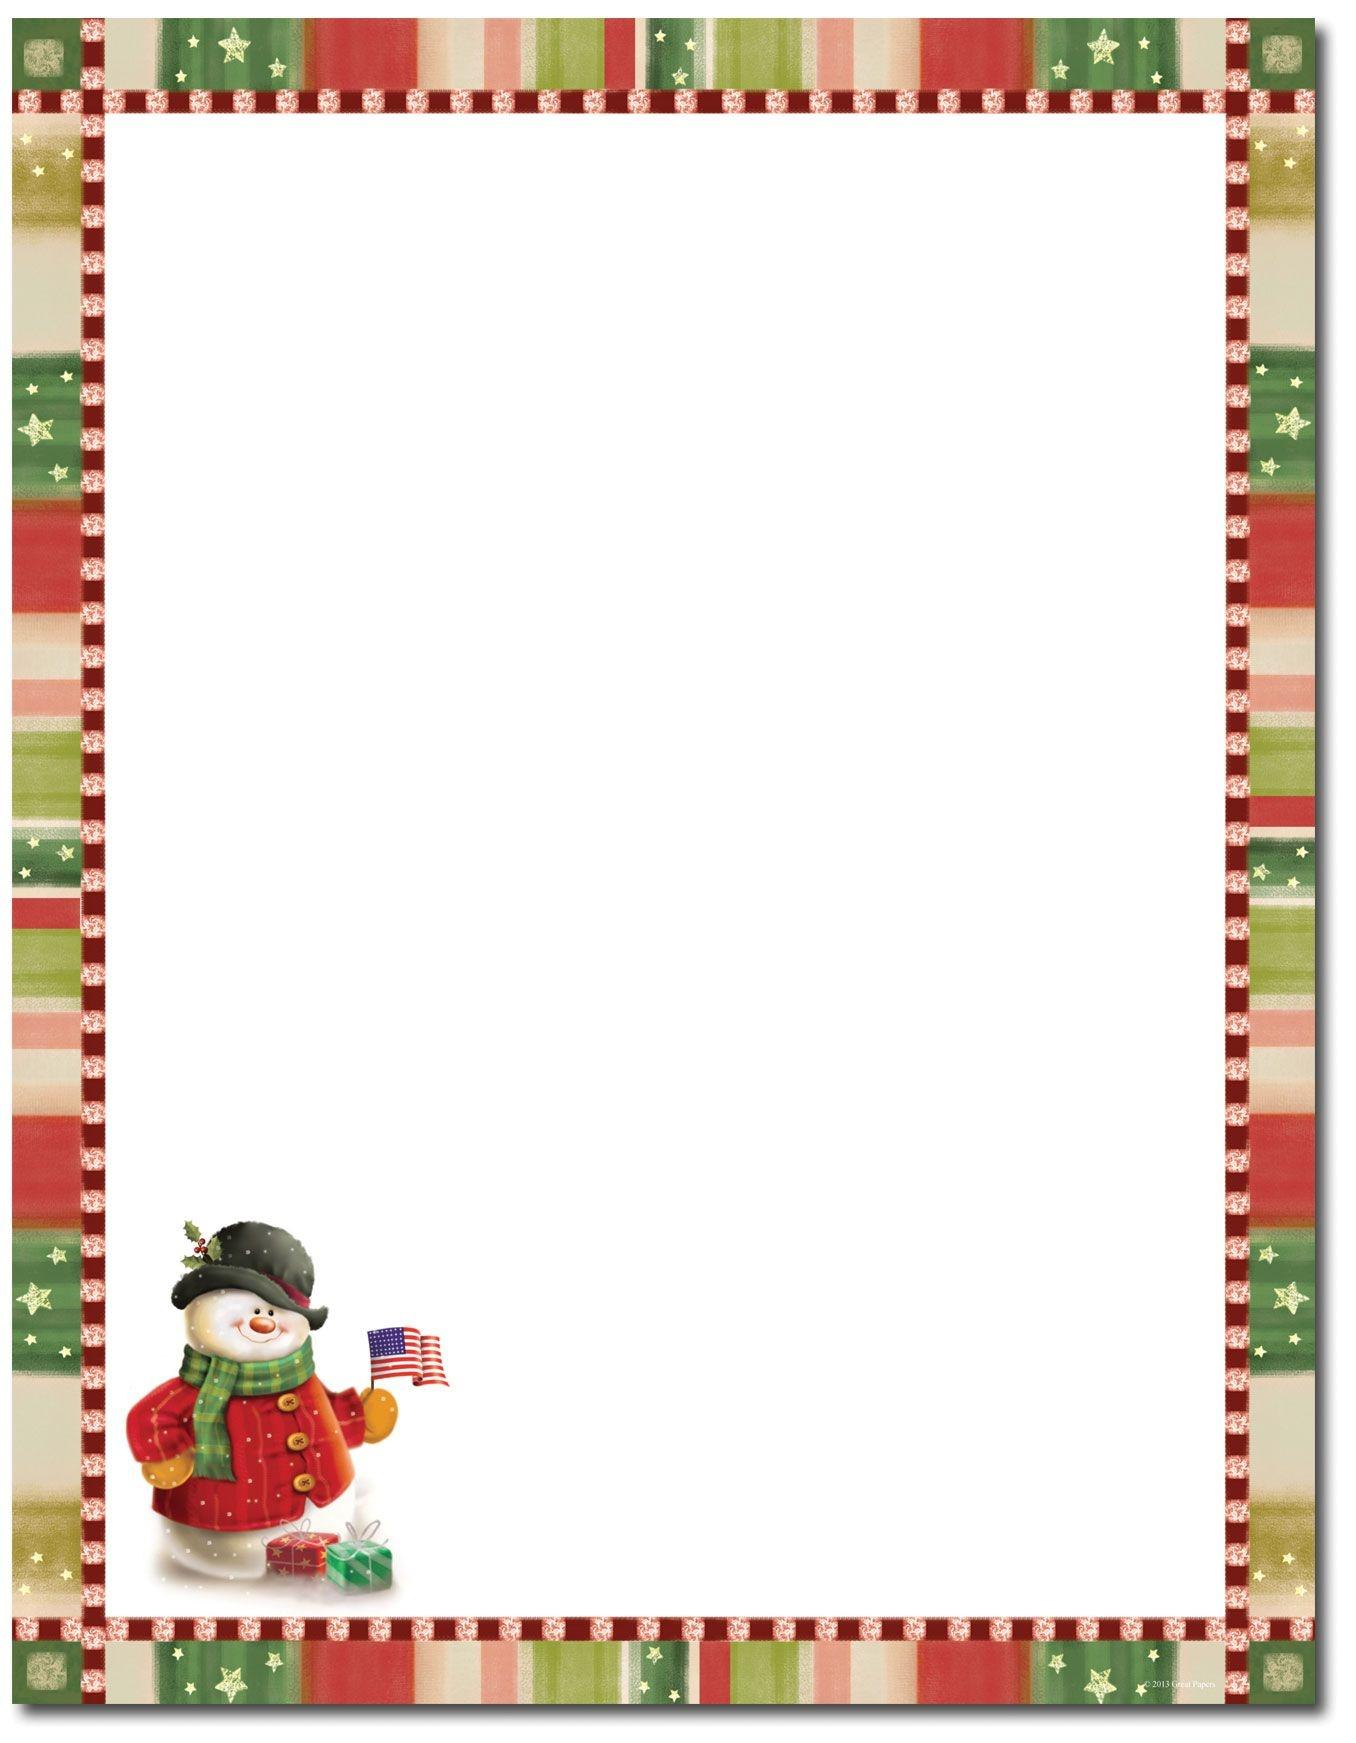 Patriotic Snowman Letterhead | Christmas Stationery | Christmas - Free Printable Christmas Letterhead